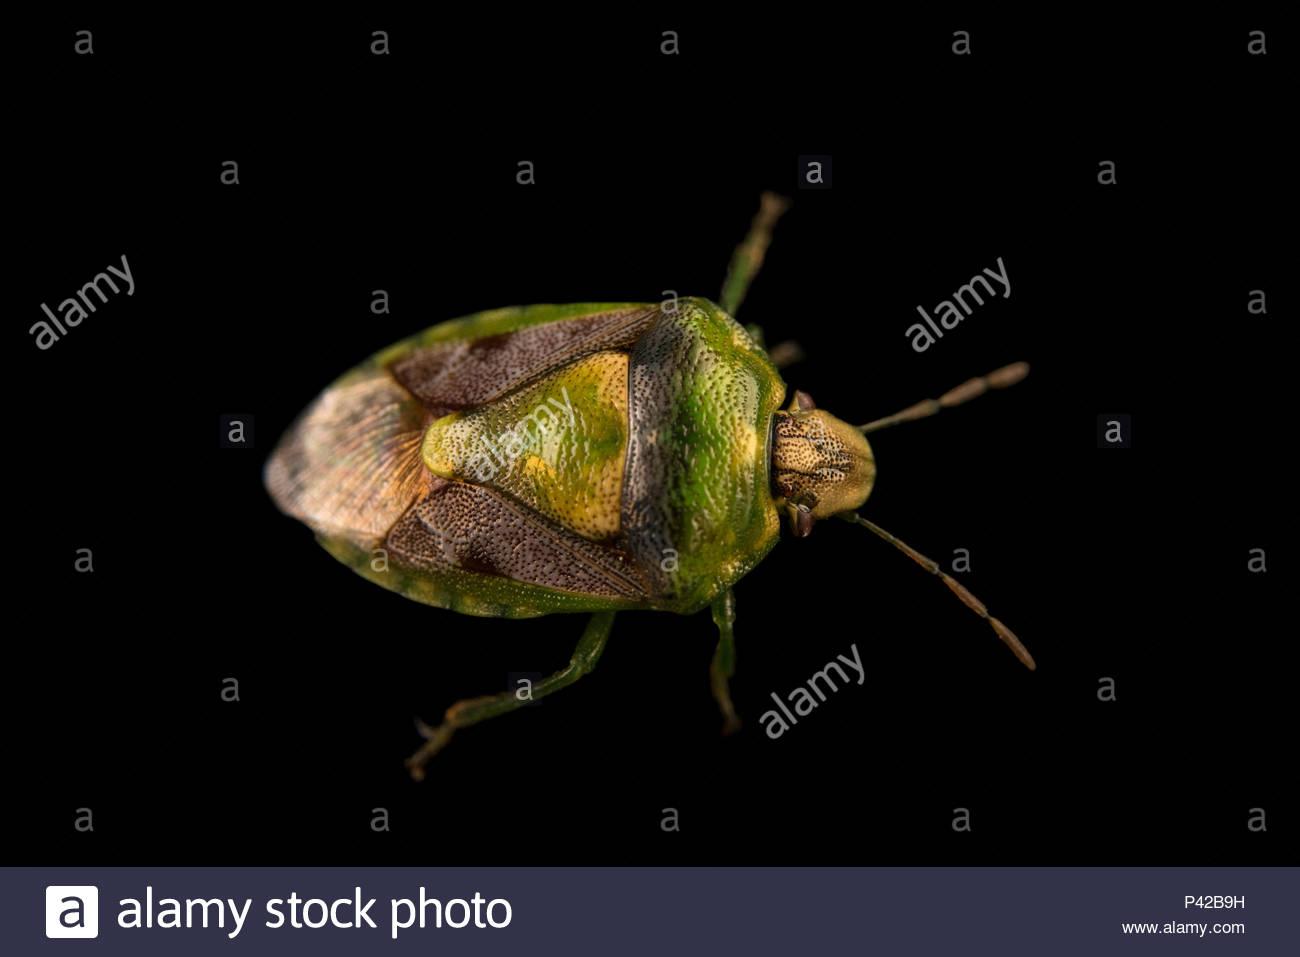 Green and red stink bug, Banasa dimidiata, at Cedar Point Biological Station. - Stock Image